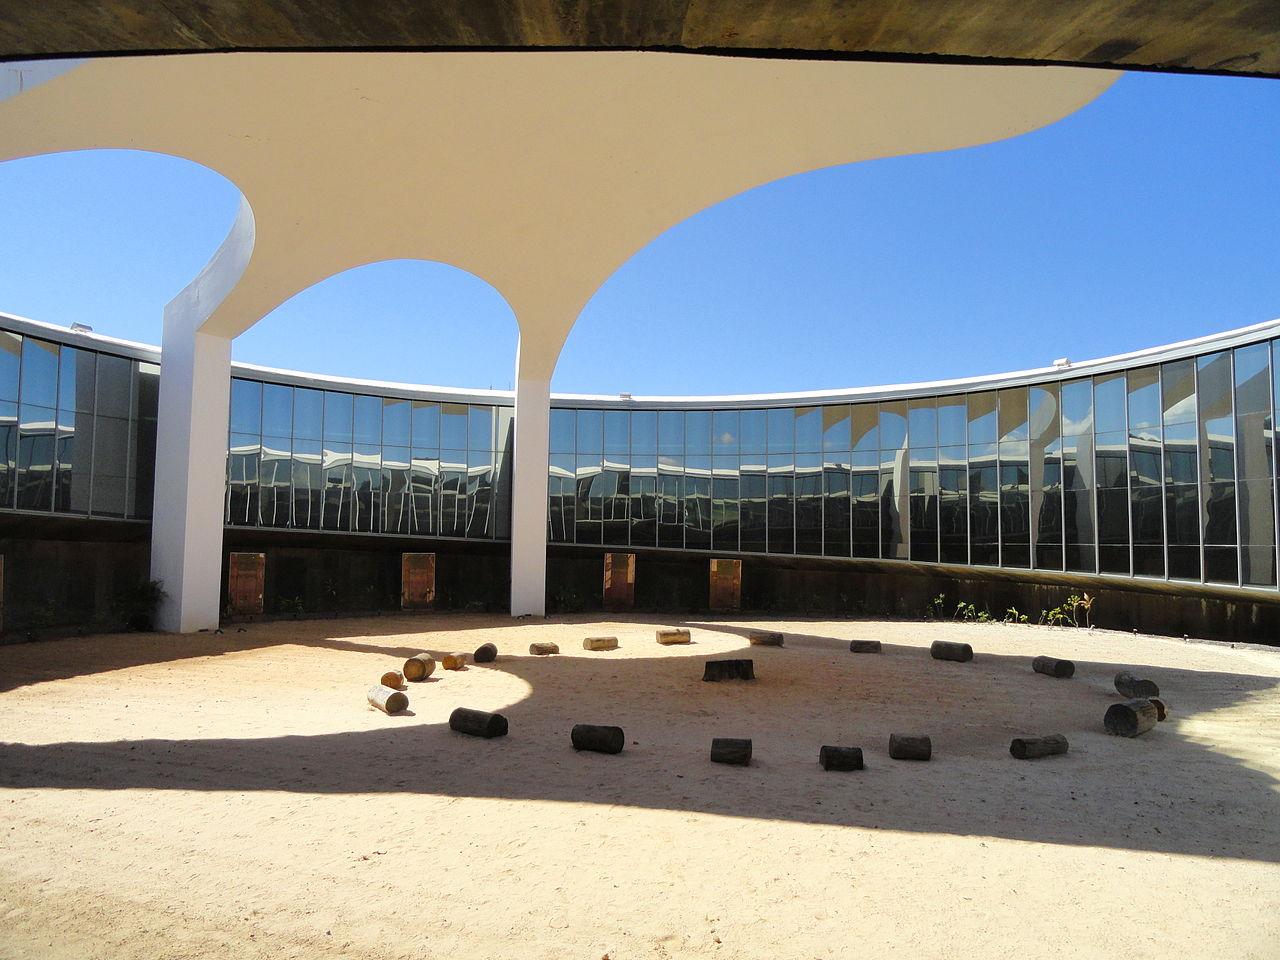 1280px-Memorial_dos_Povos_Indígenas_-_Brasilia_-_DSC00597.JPG